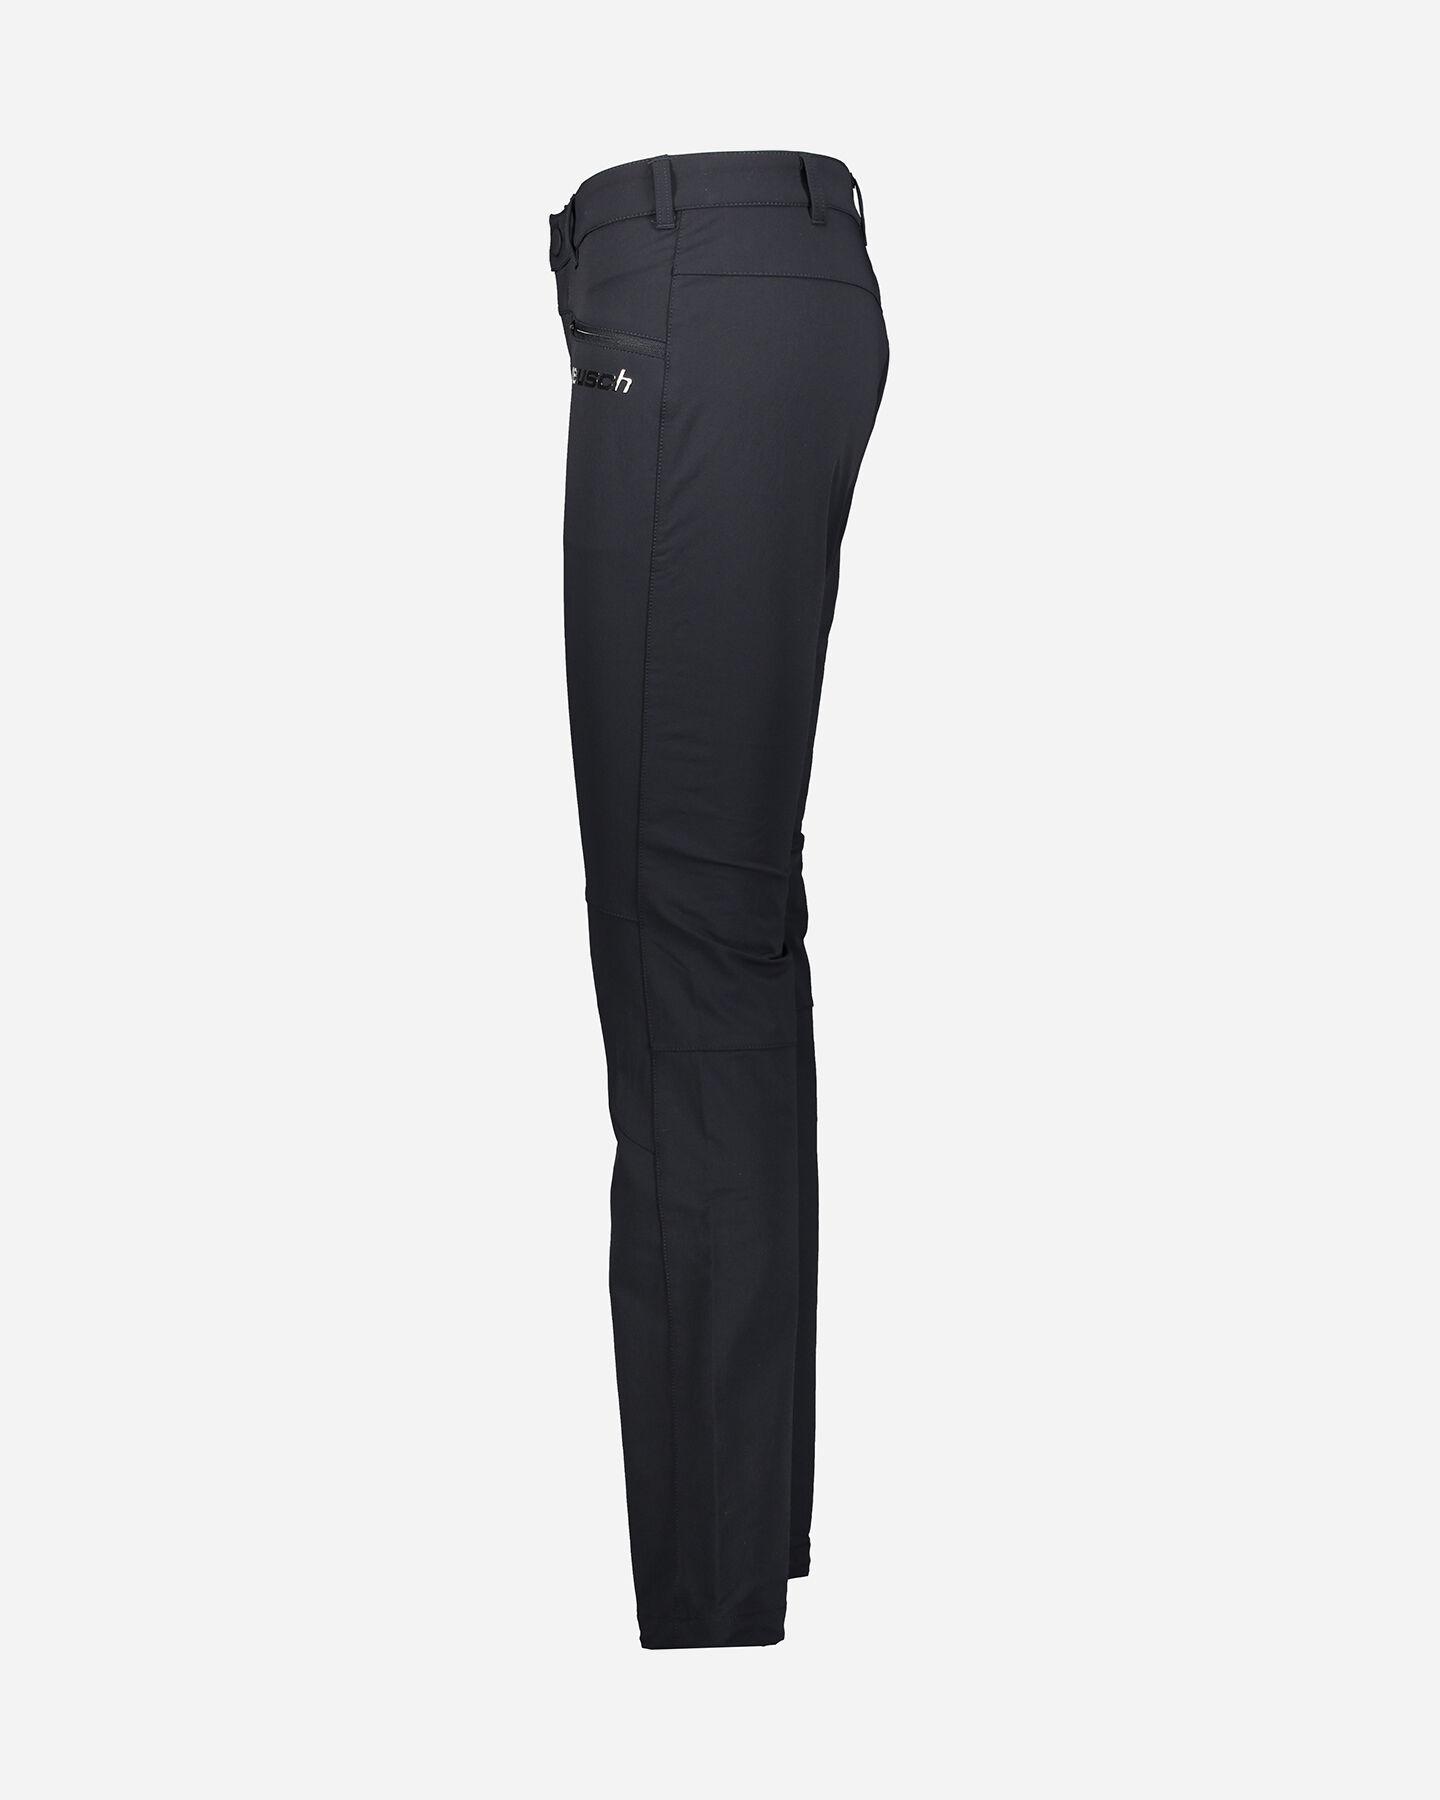 Pantalone outdoor REUSCH BASIC W S4081949 scatto 1